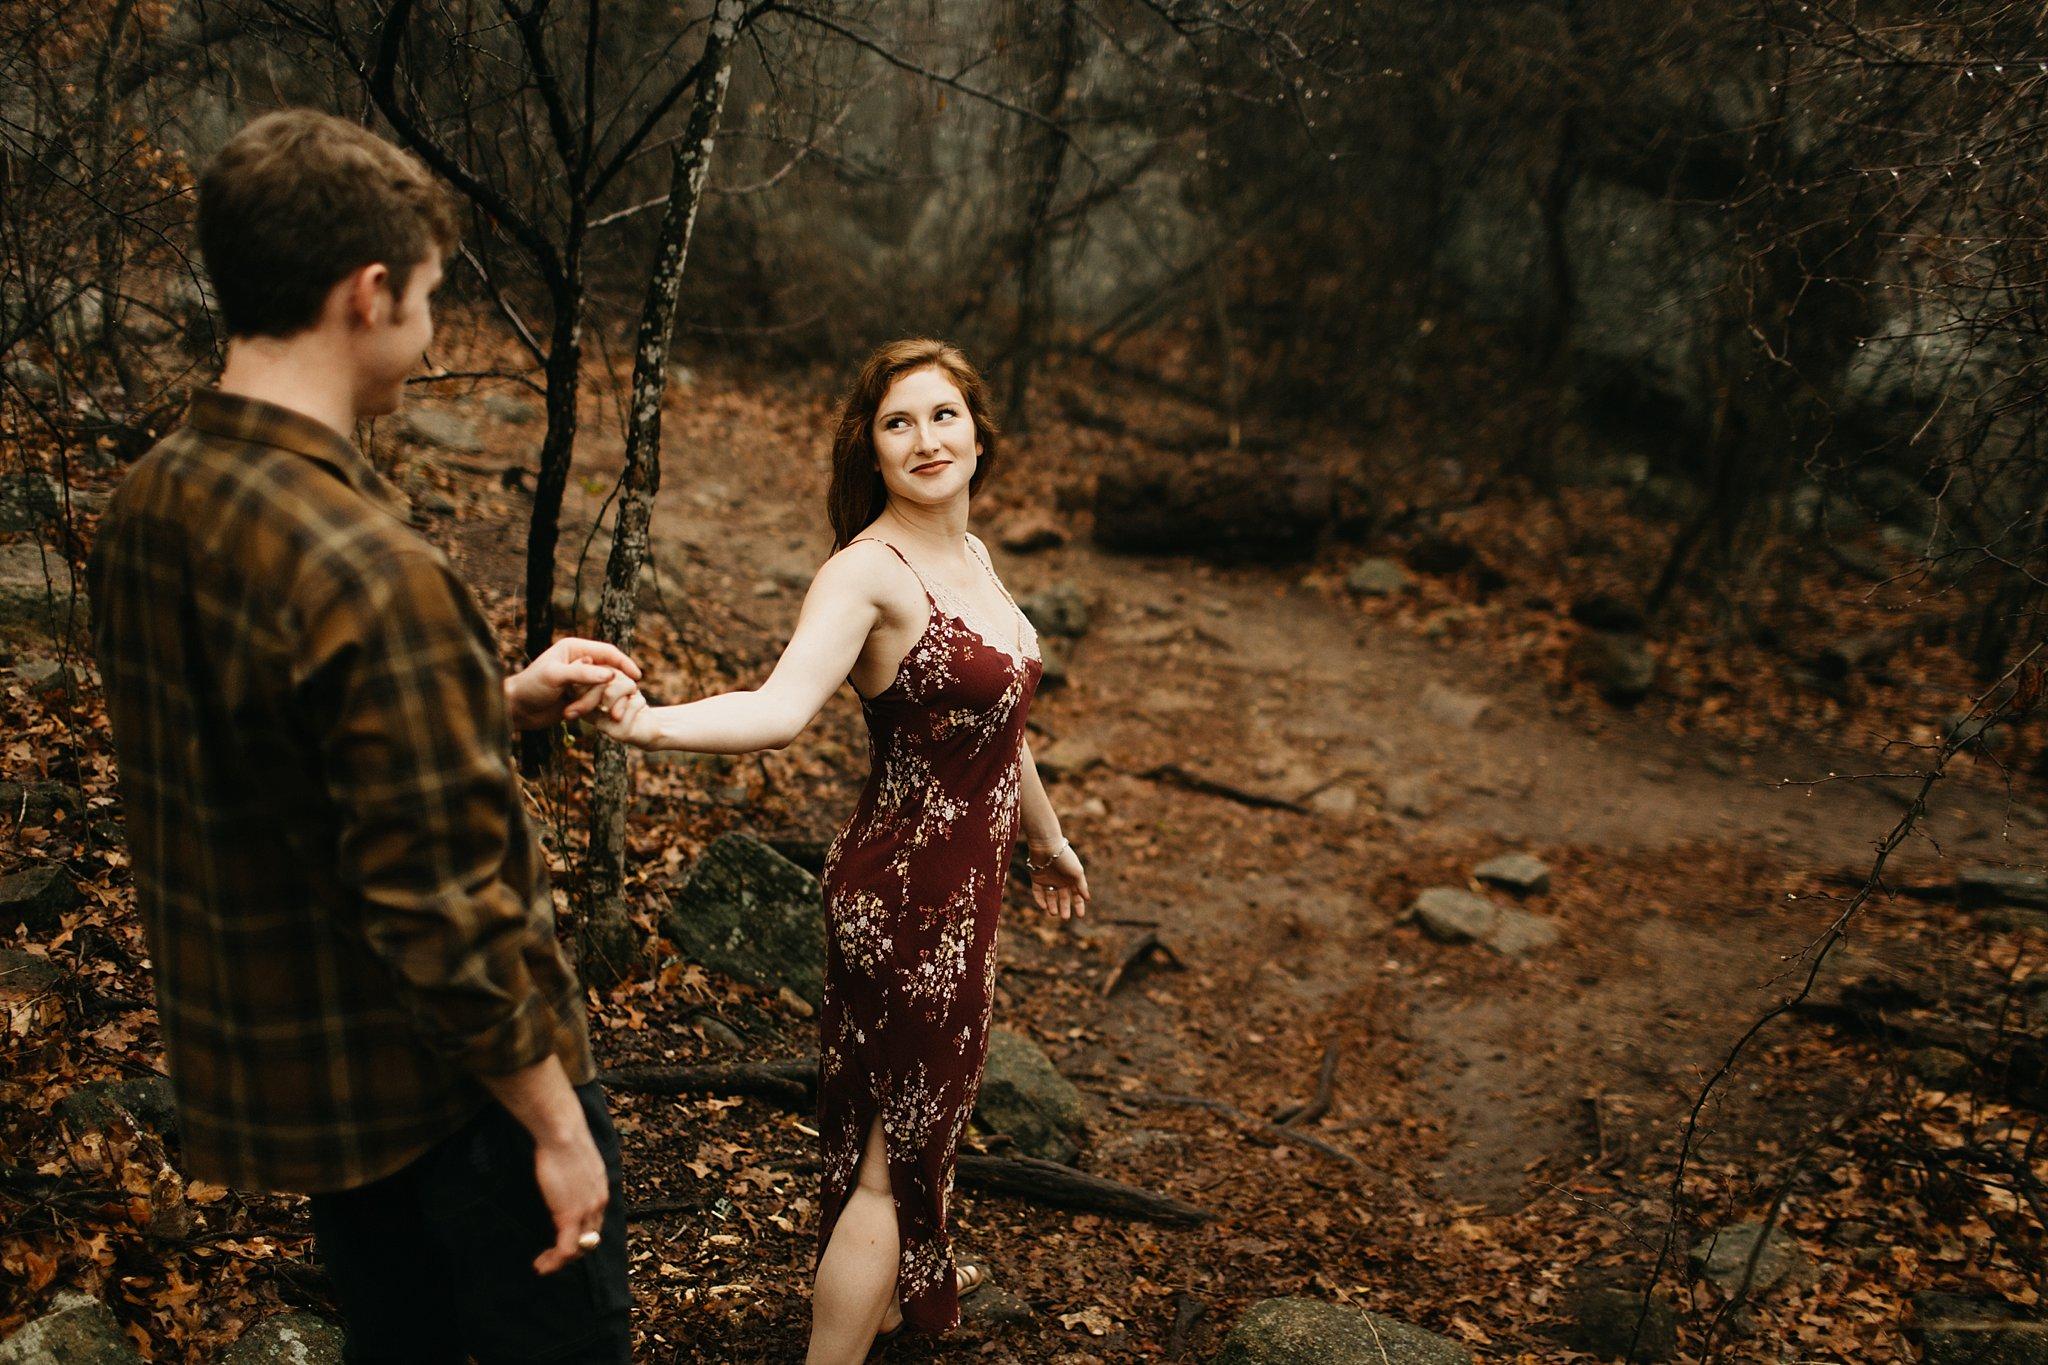 Wilderlove Co_Mineral Wells Texas_Mineral Wells State Park_Adventure Engagement Photography_0027.jpg